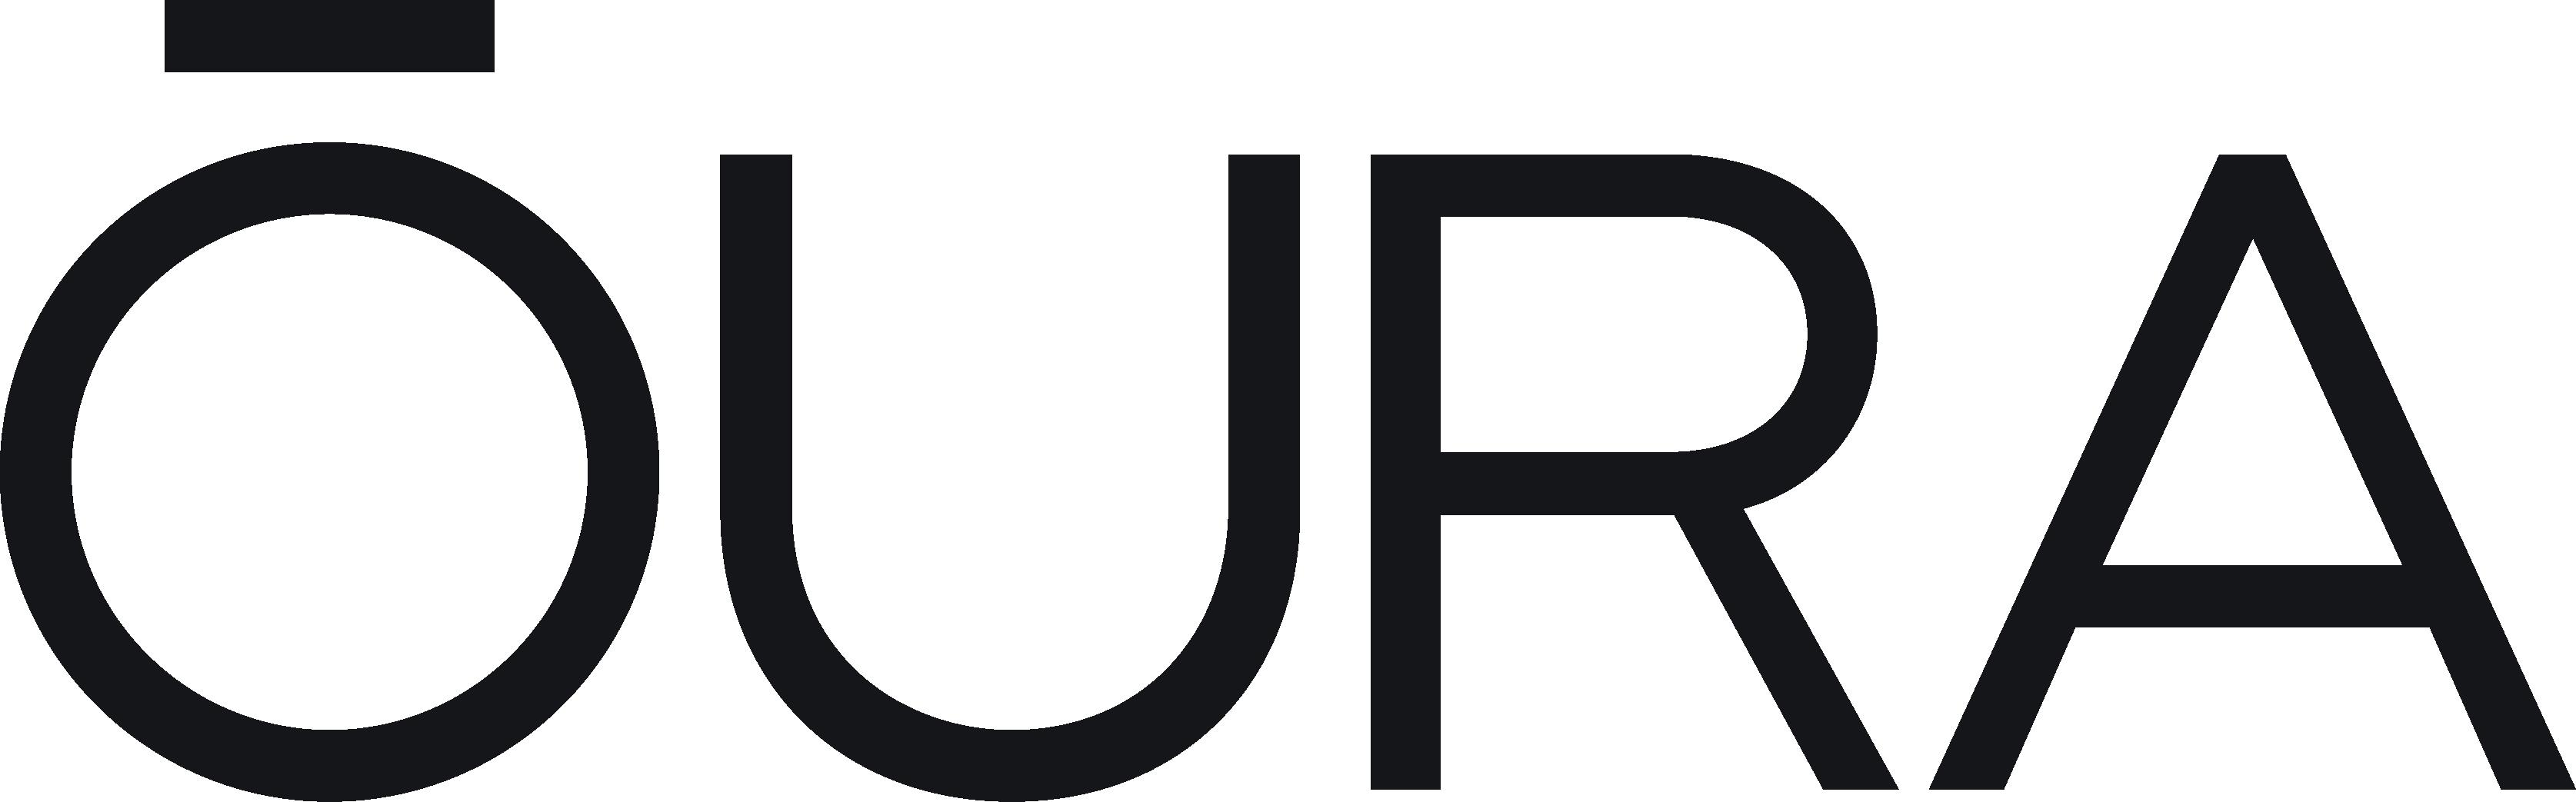 Oura Ring logo